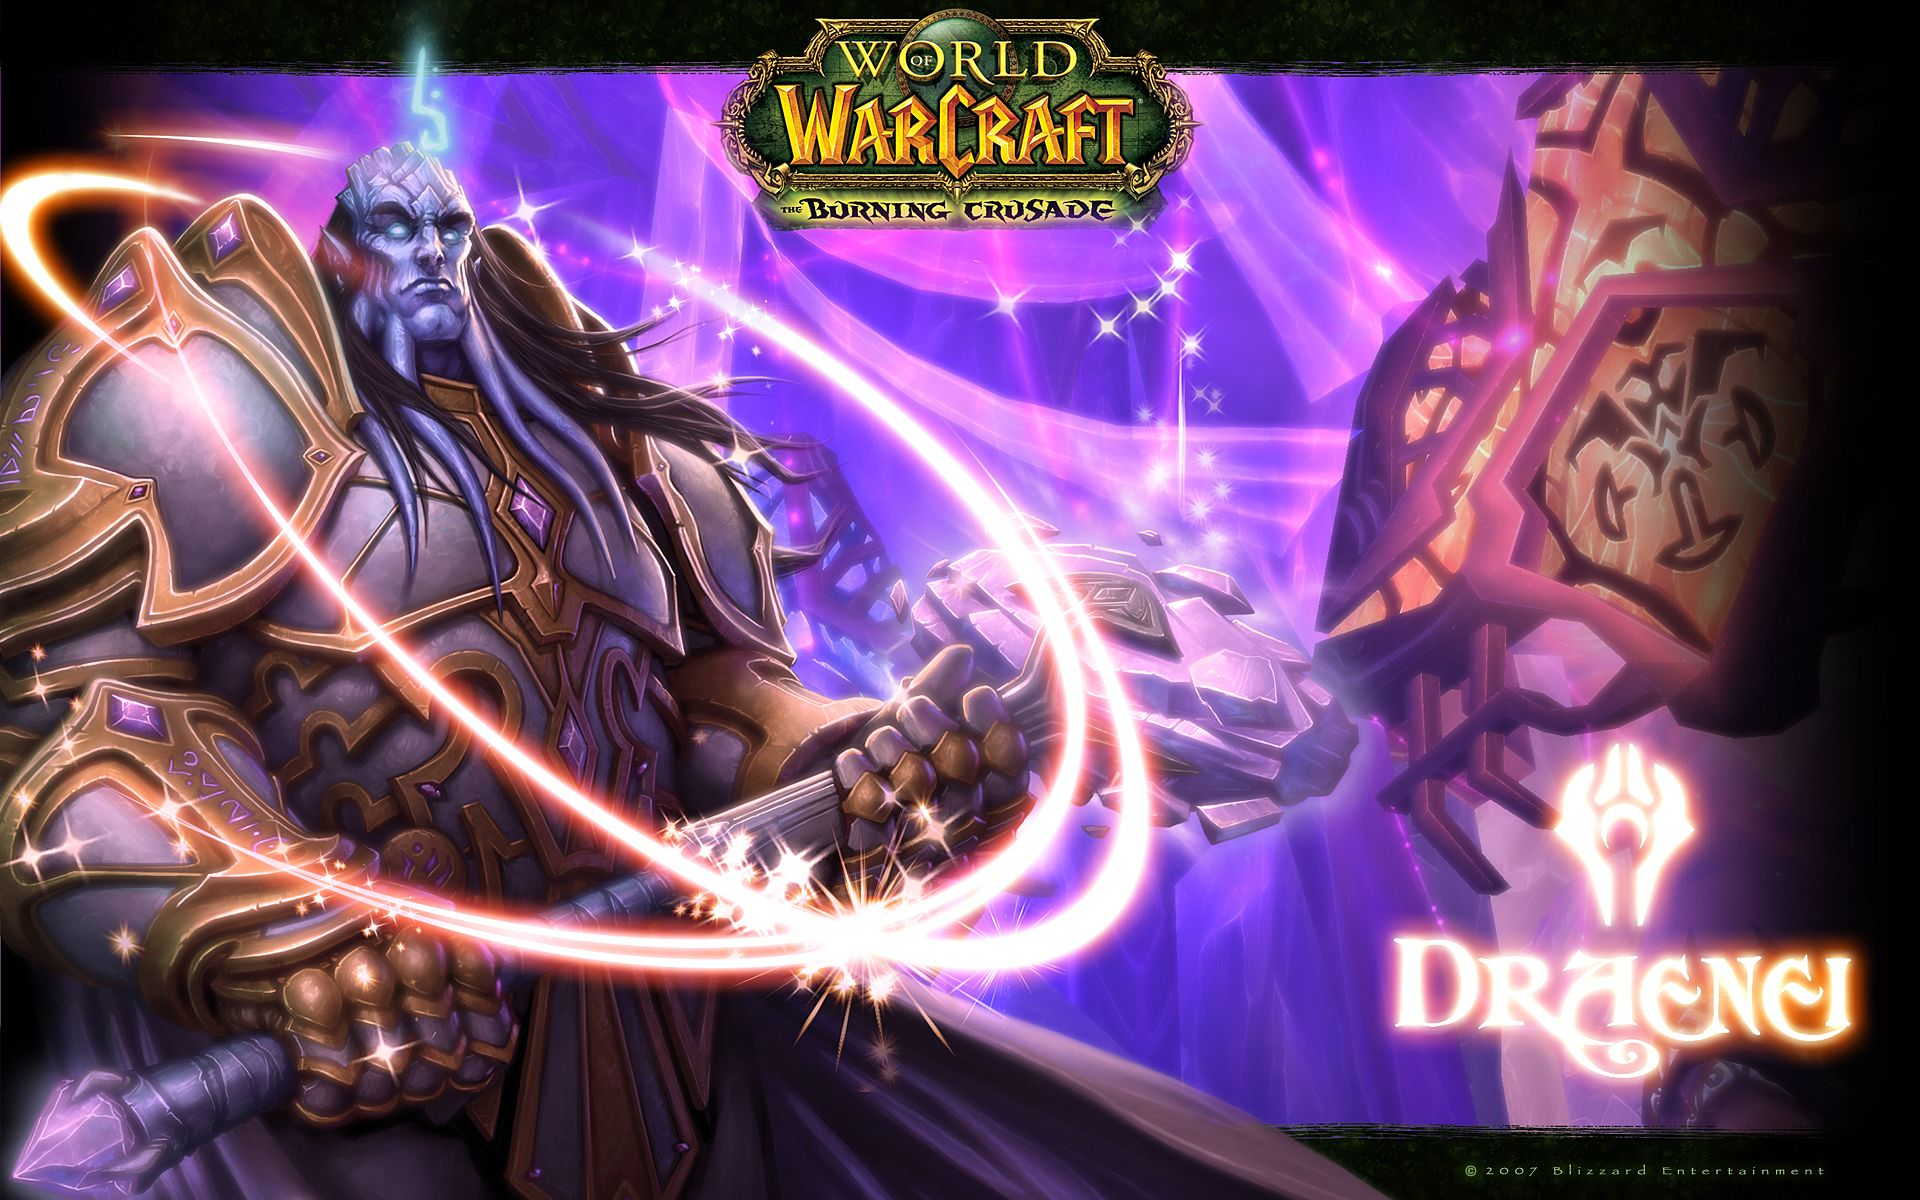 World Of Warcraft The Burning Crusade Wallpaper 3731